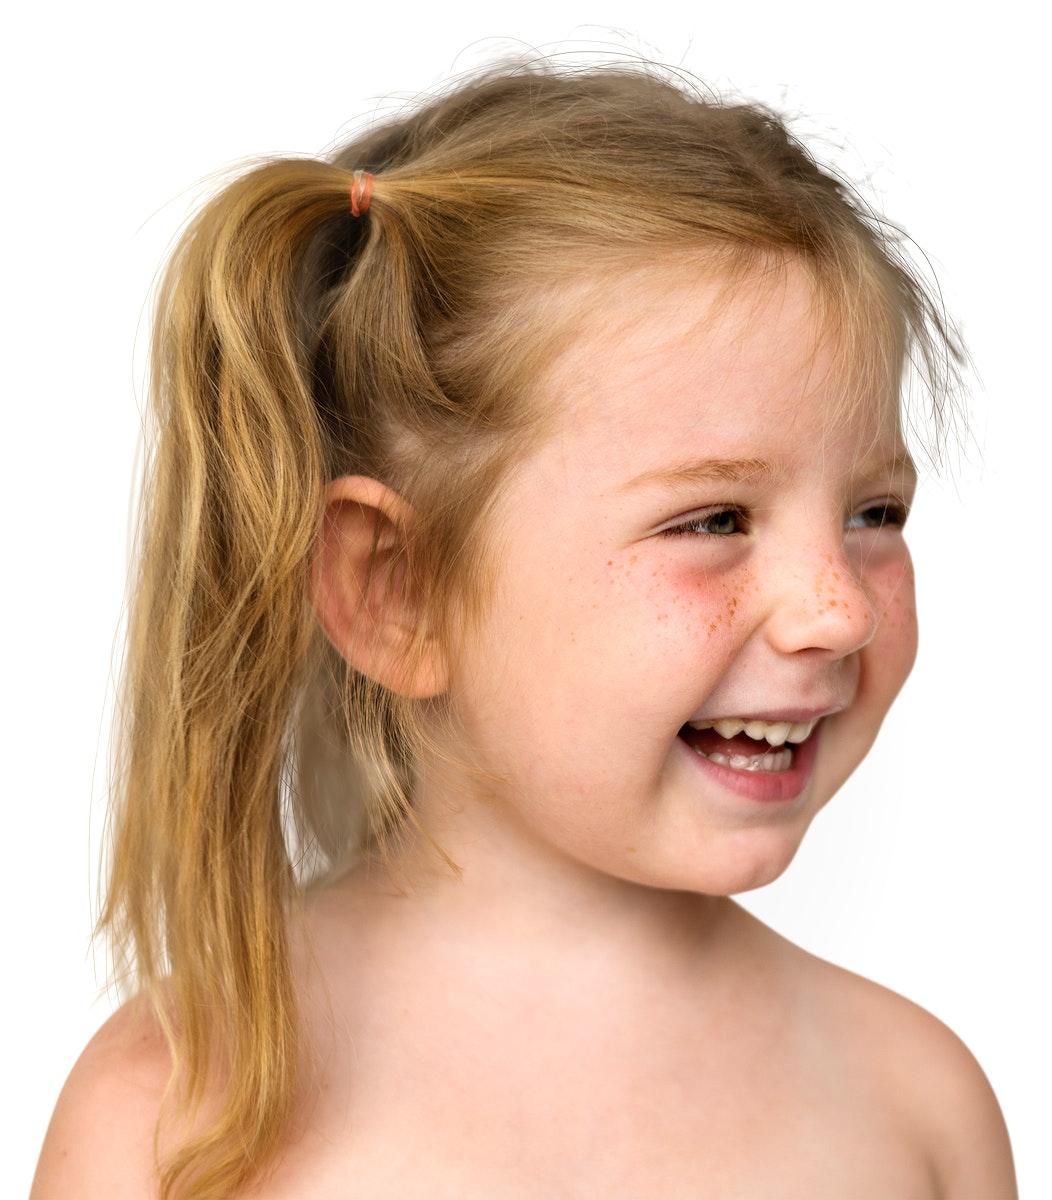 Little Girl Face Expression Portrait